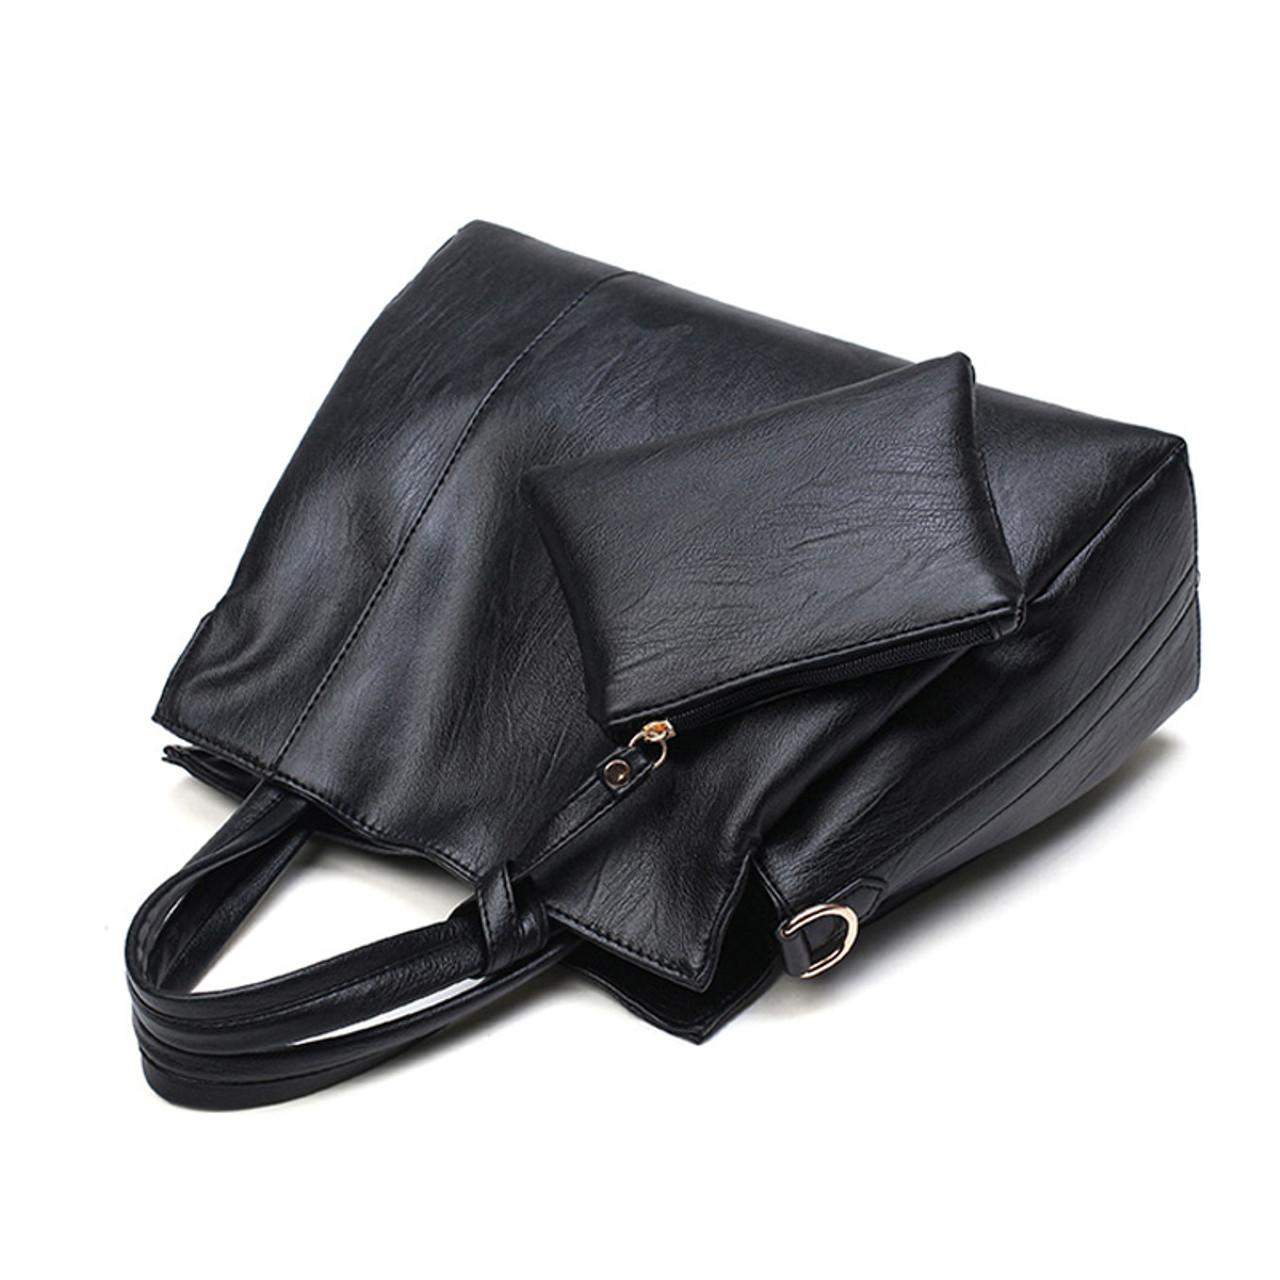 c241cdc6be9e ... Luxury Handbags Women Bags Designer High Quality PU Leather Handbags  Solid Tote Bag For Women 2 ...